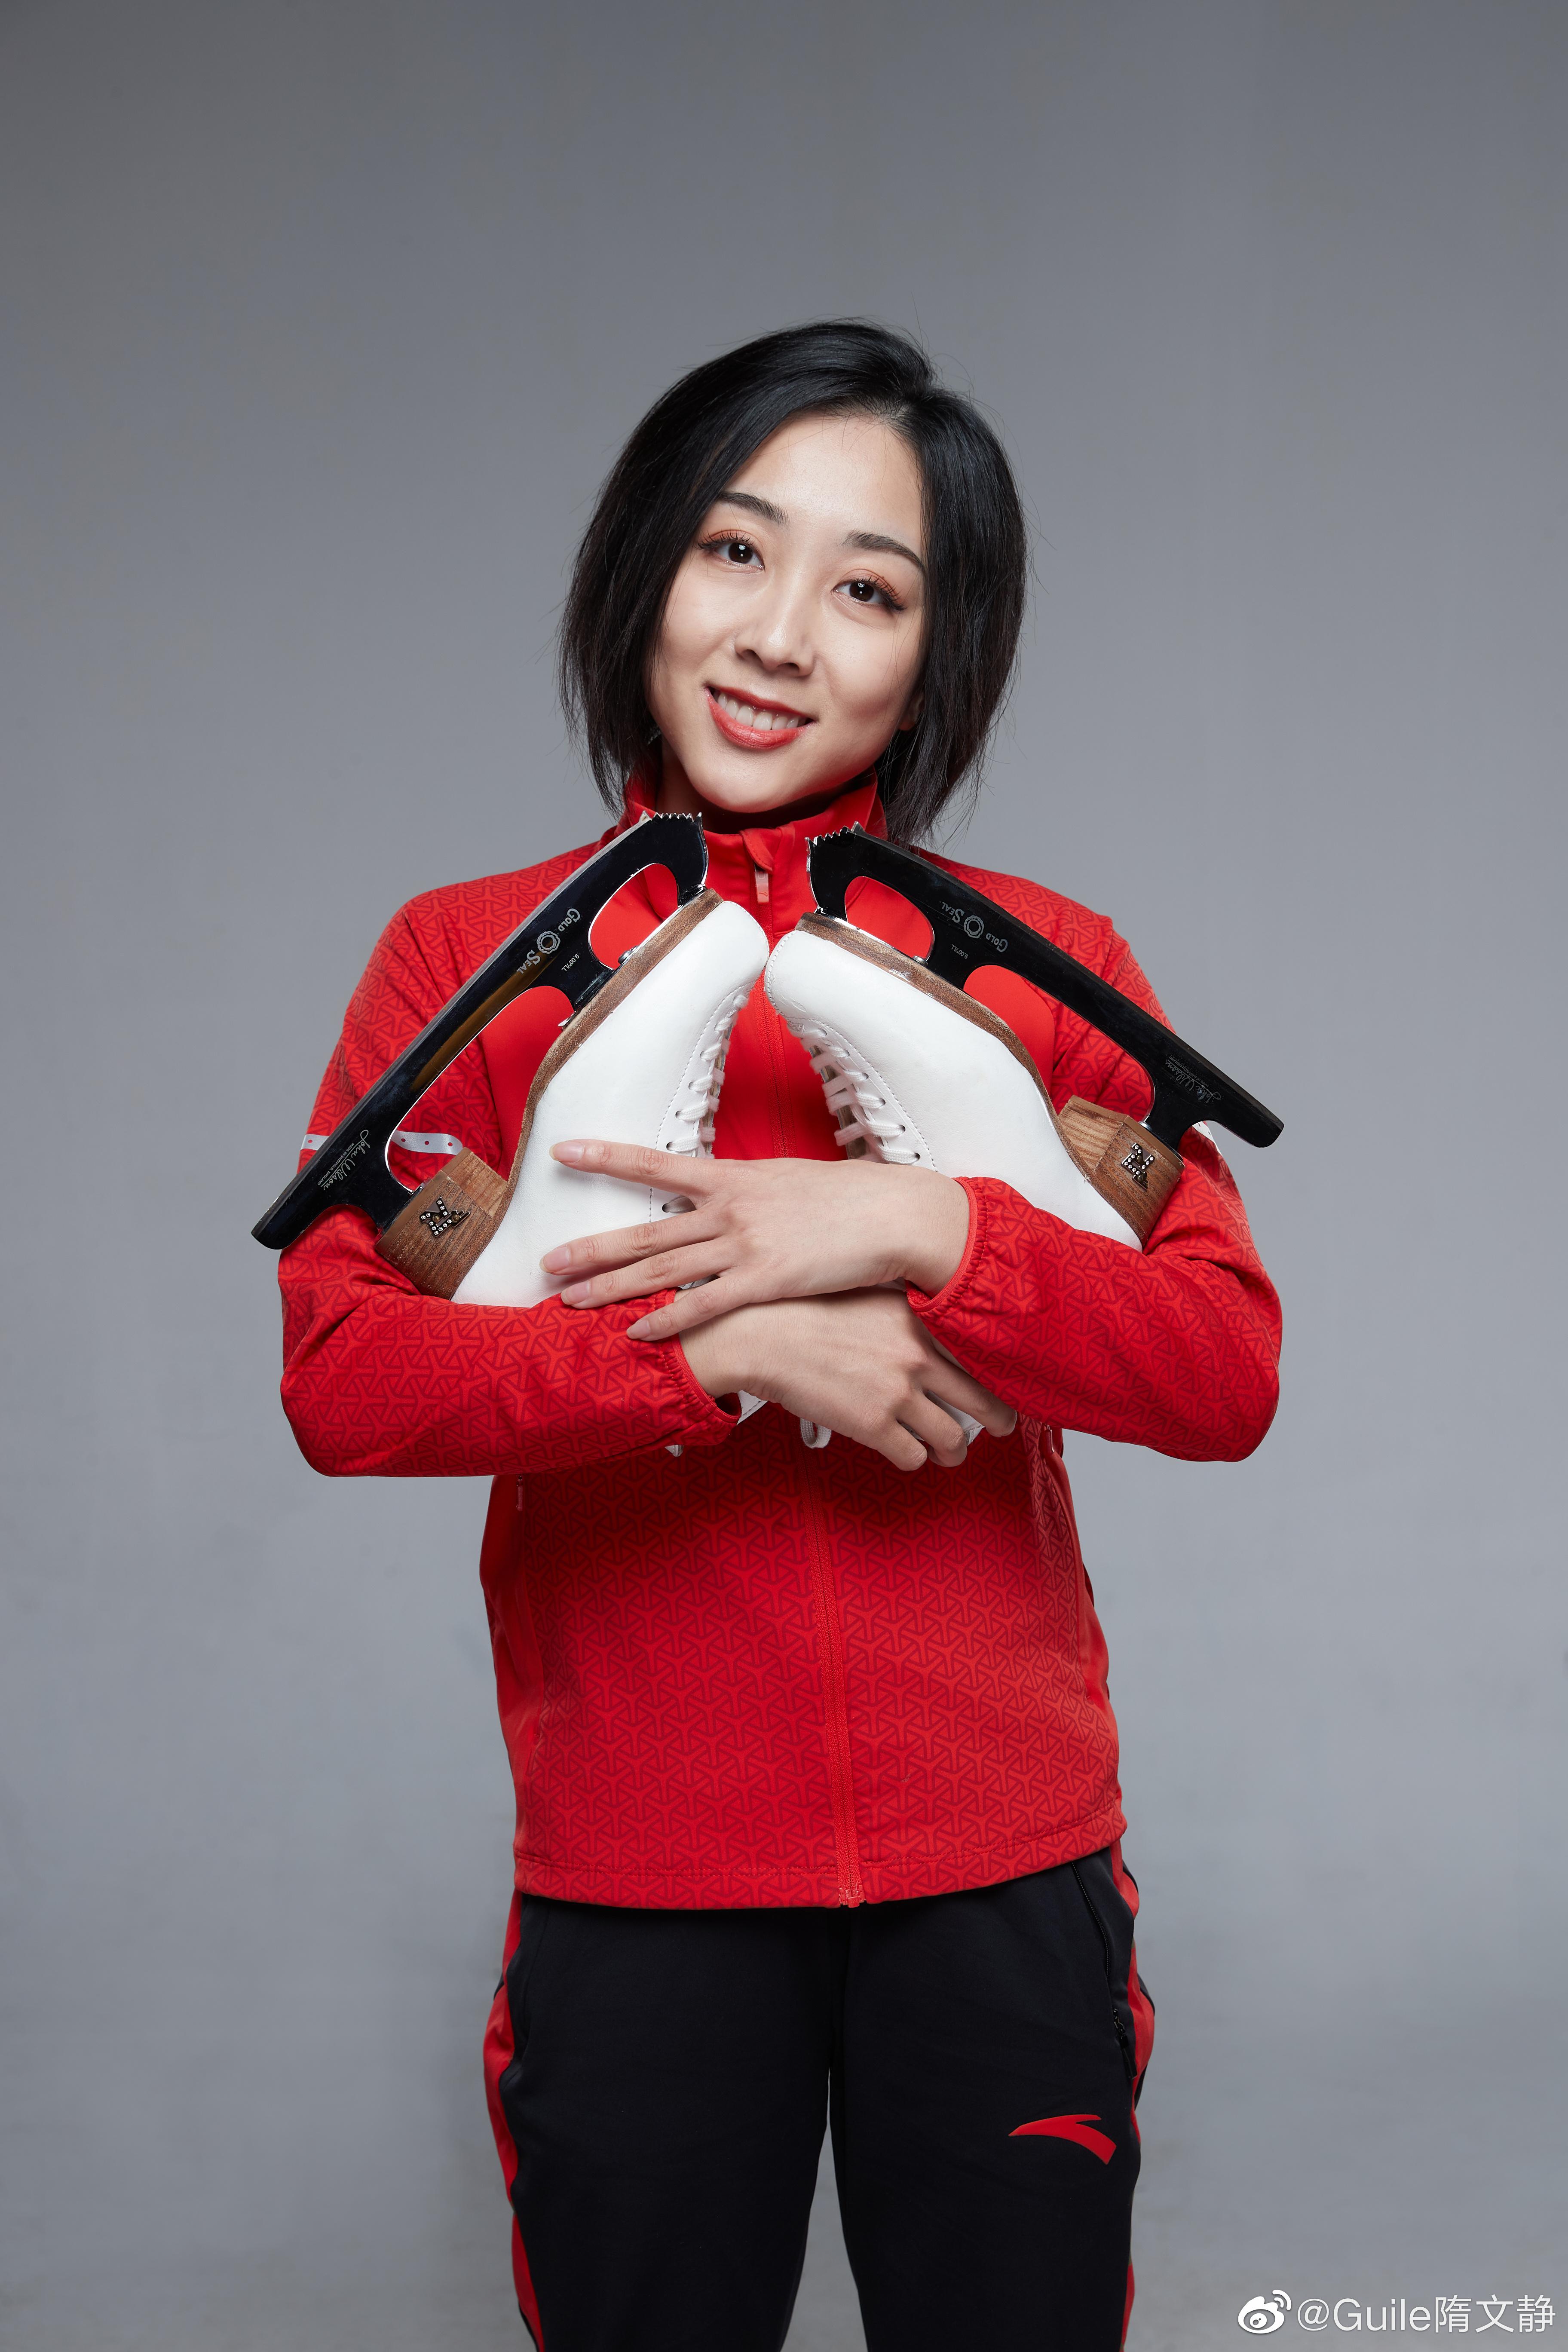 Вэньцзин Суй - Цун Хань / Wenjing SUI - Cong HAN CHN - Страница 18 1erumm8h4zlgqjvtwlft68rc